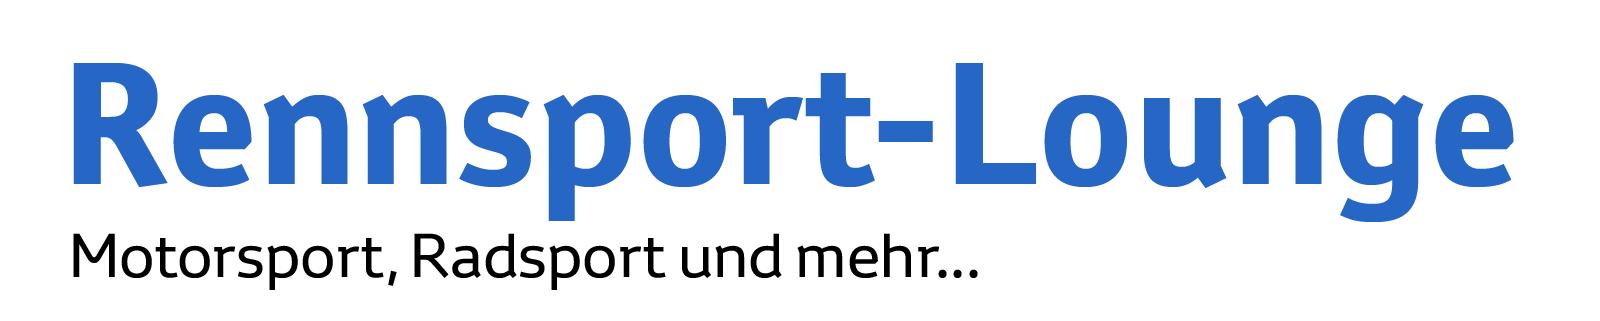 Rennsport-Lounge